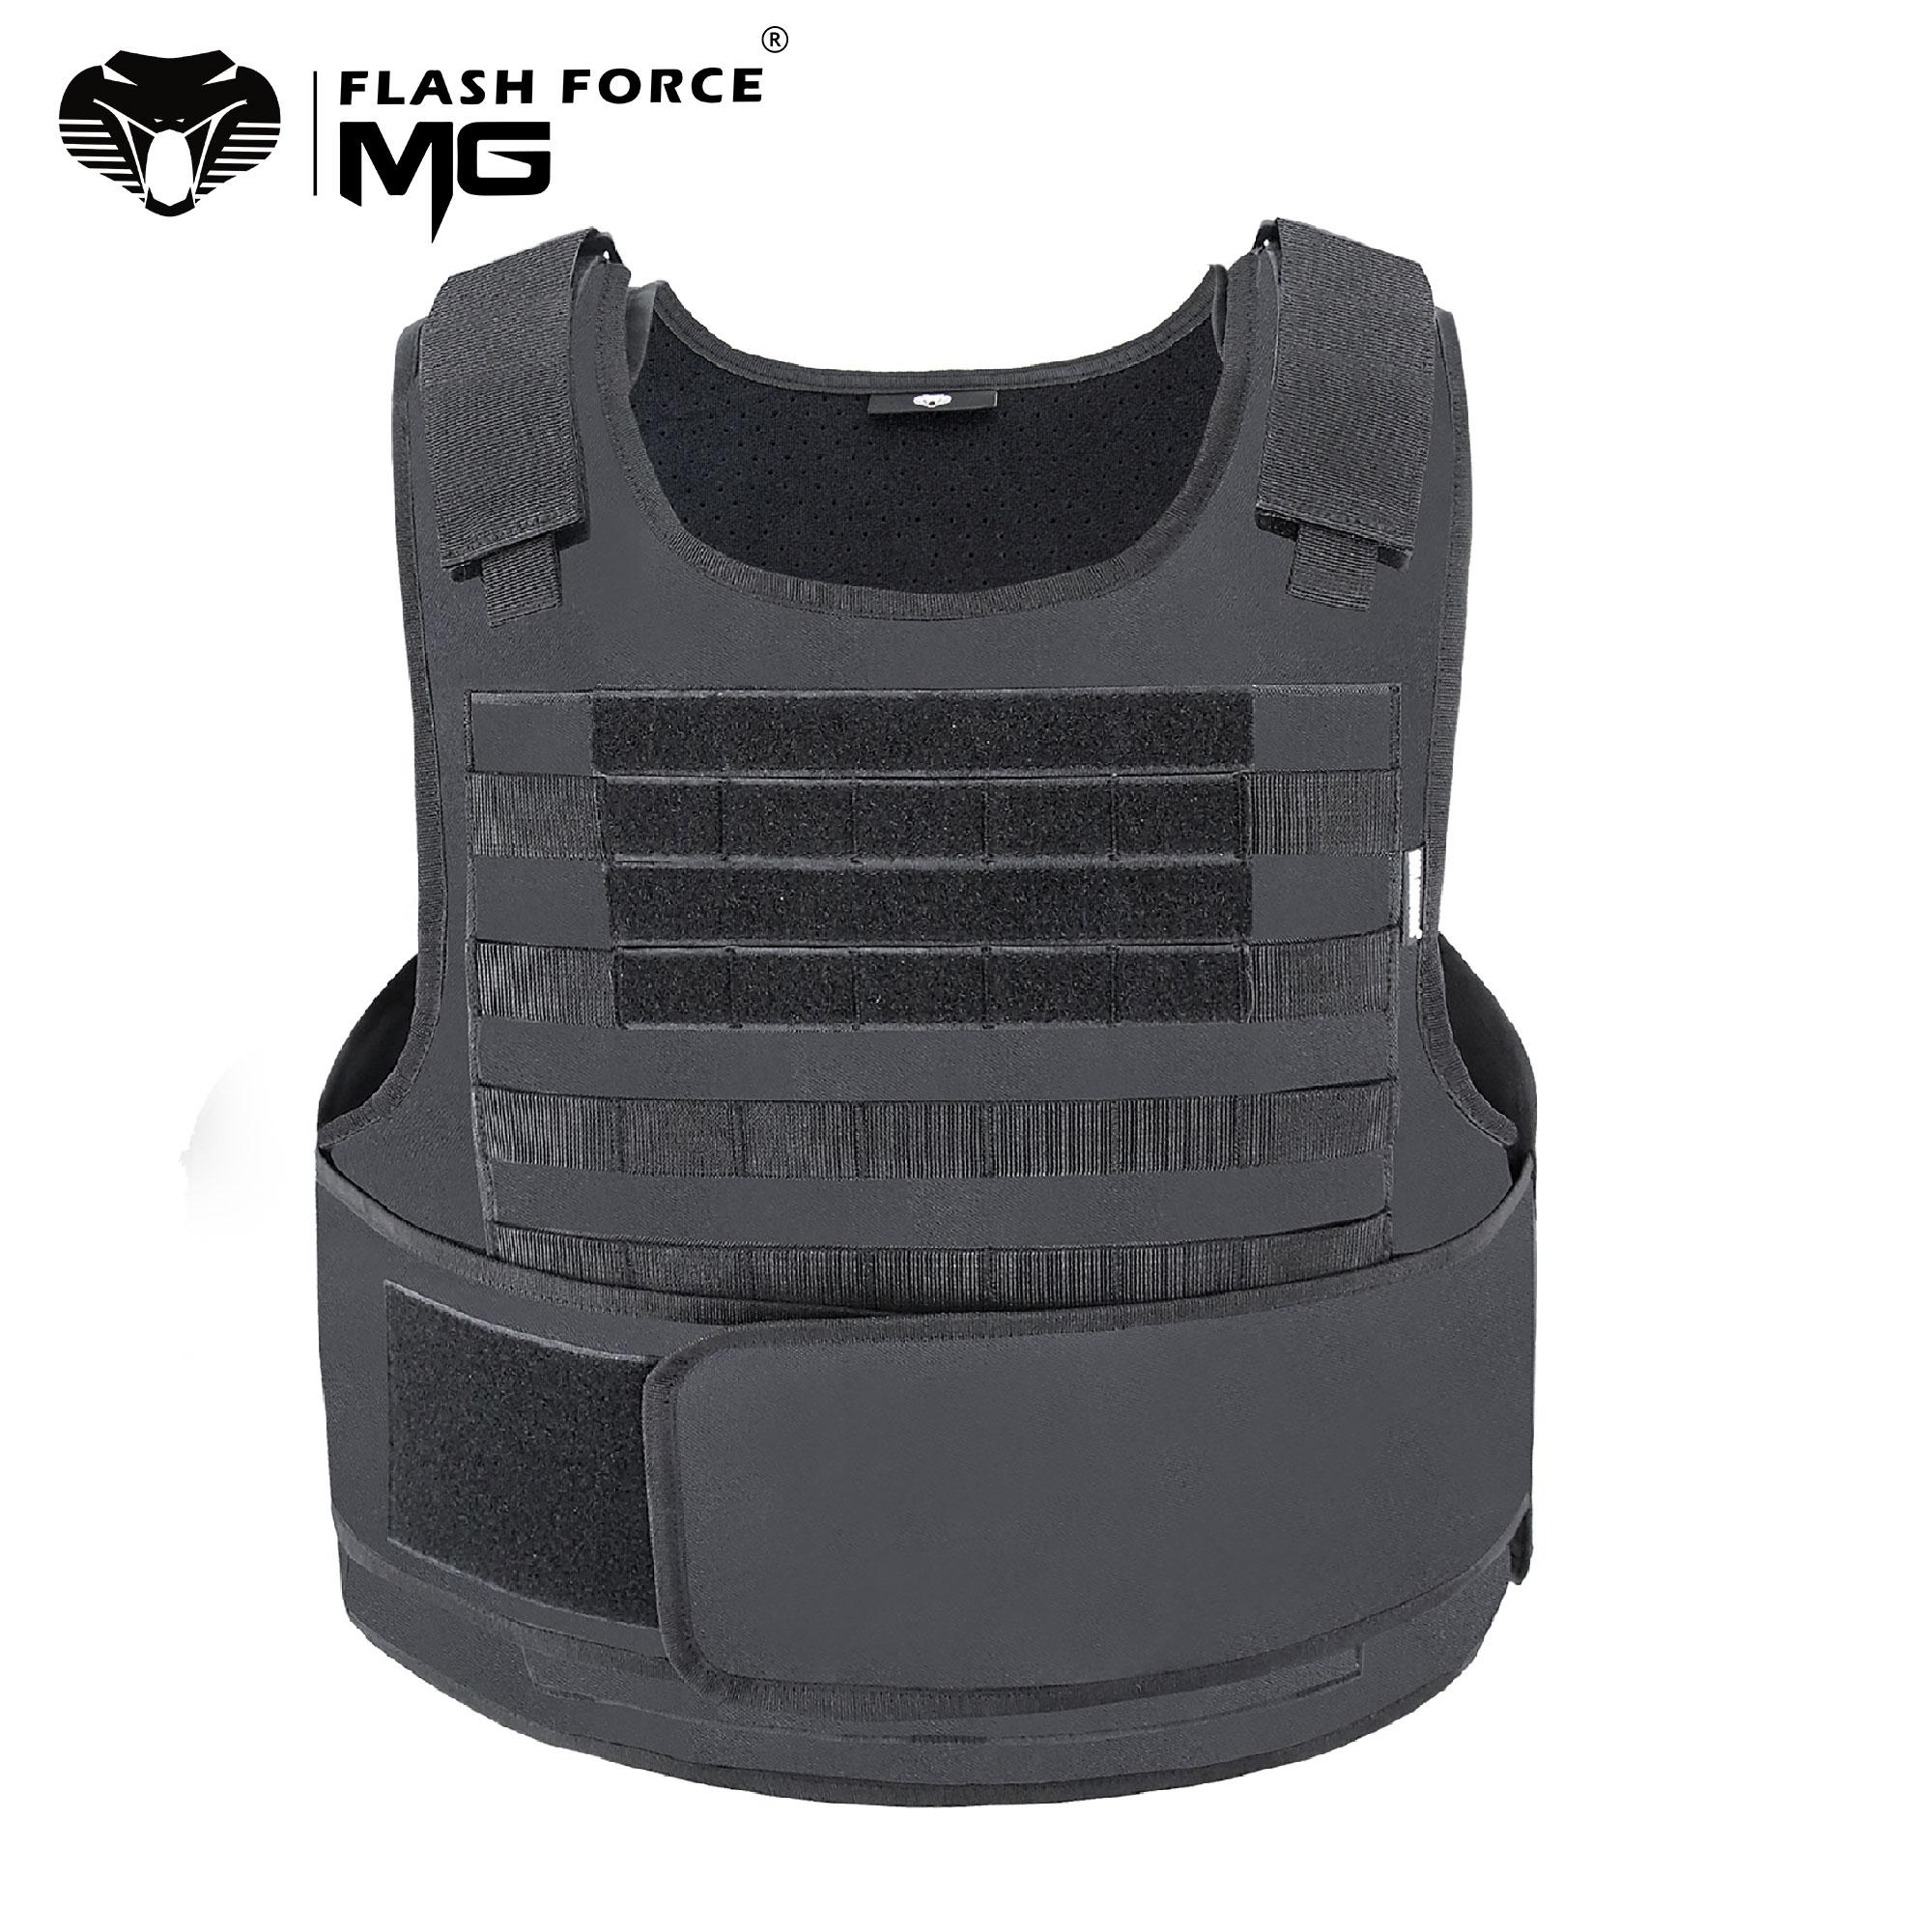 Mgflash force الادسنس الصدرية التكتيكية لوحة الناقل سوات الصيد الصيد العسكرية الجيش درع الشرطة سترة مول